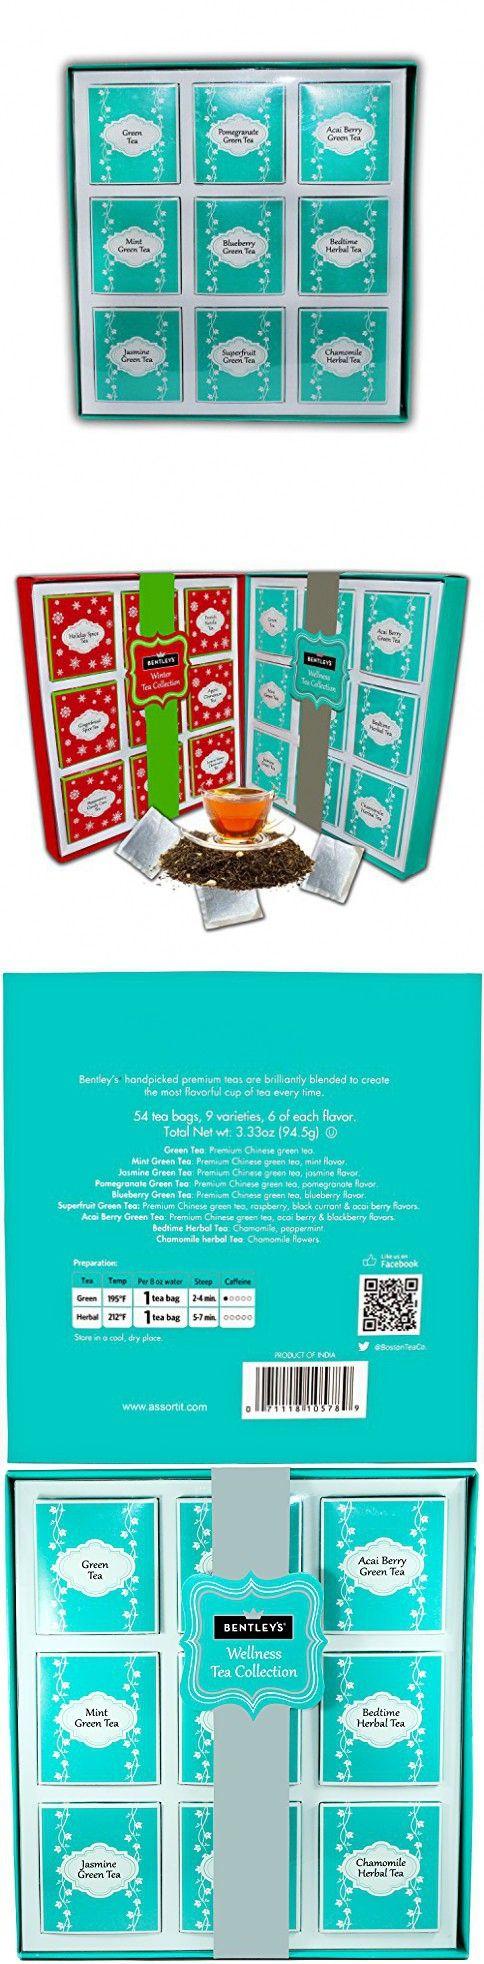 The Boston Tea Company Premium Teas Variety Sampler Pack for Green & Herbal 6 of Each Flavor 9 Varieties (54-Count)